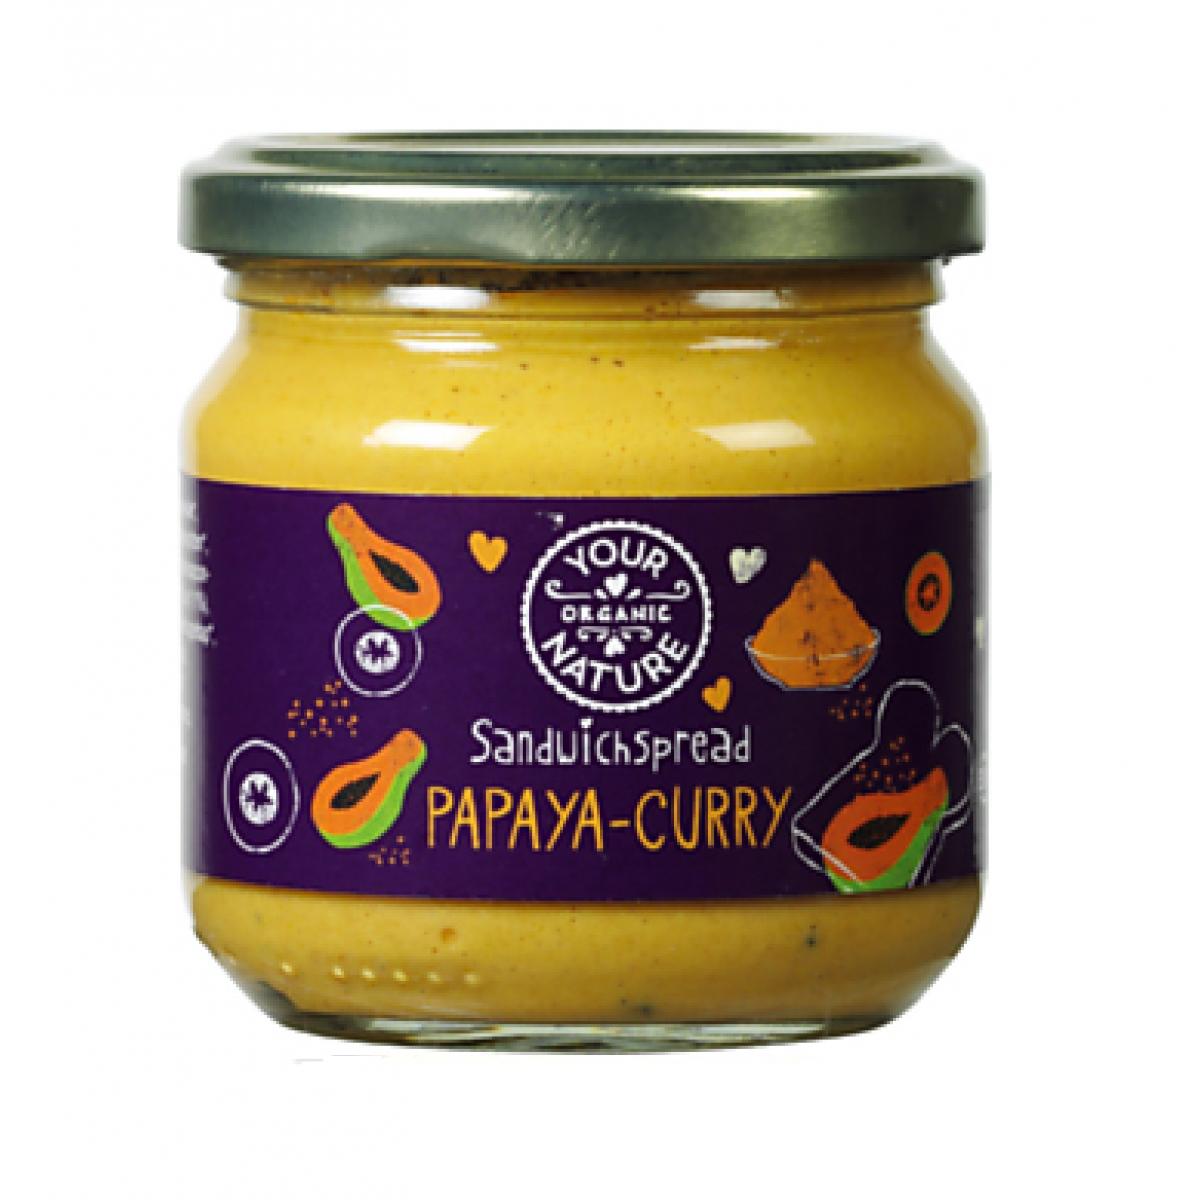 Papaya Curry Sandwichspread